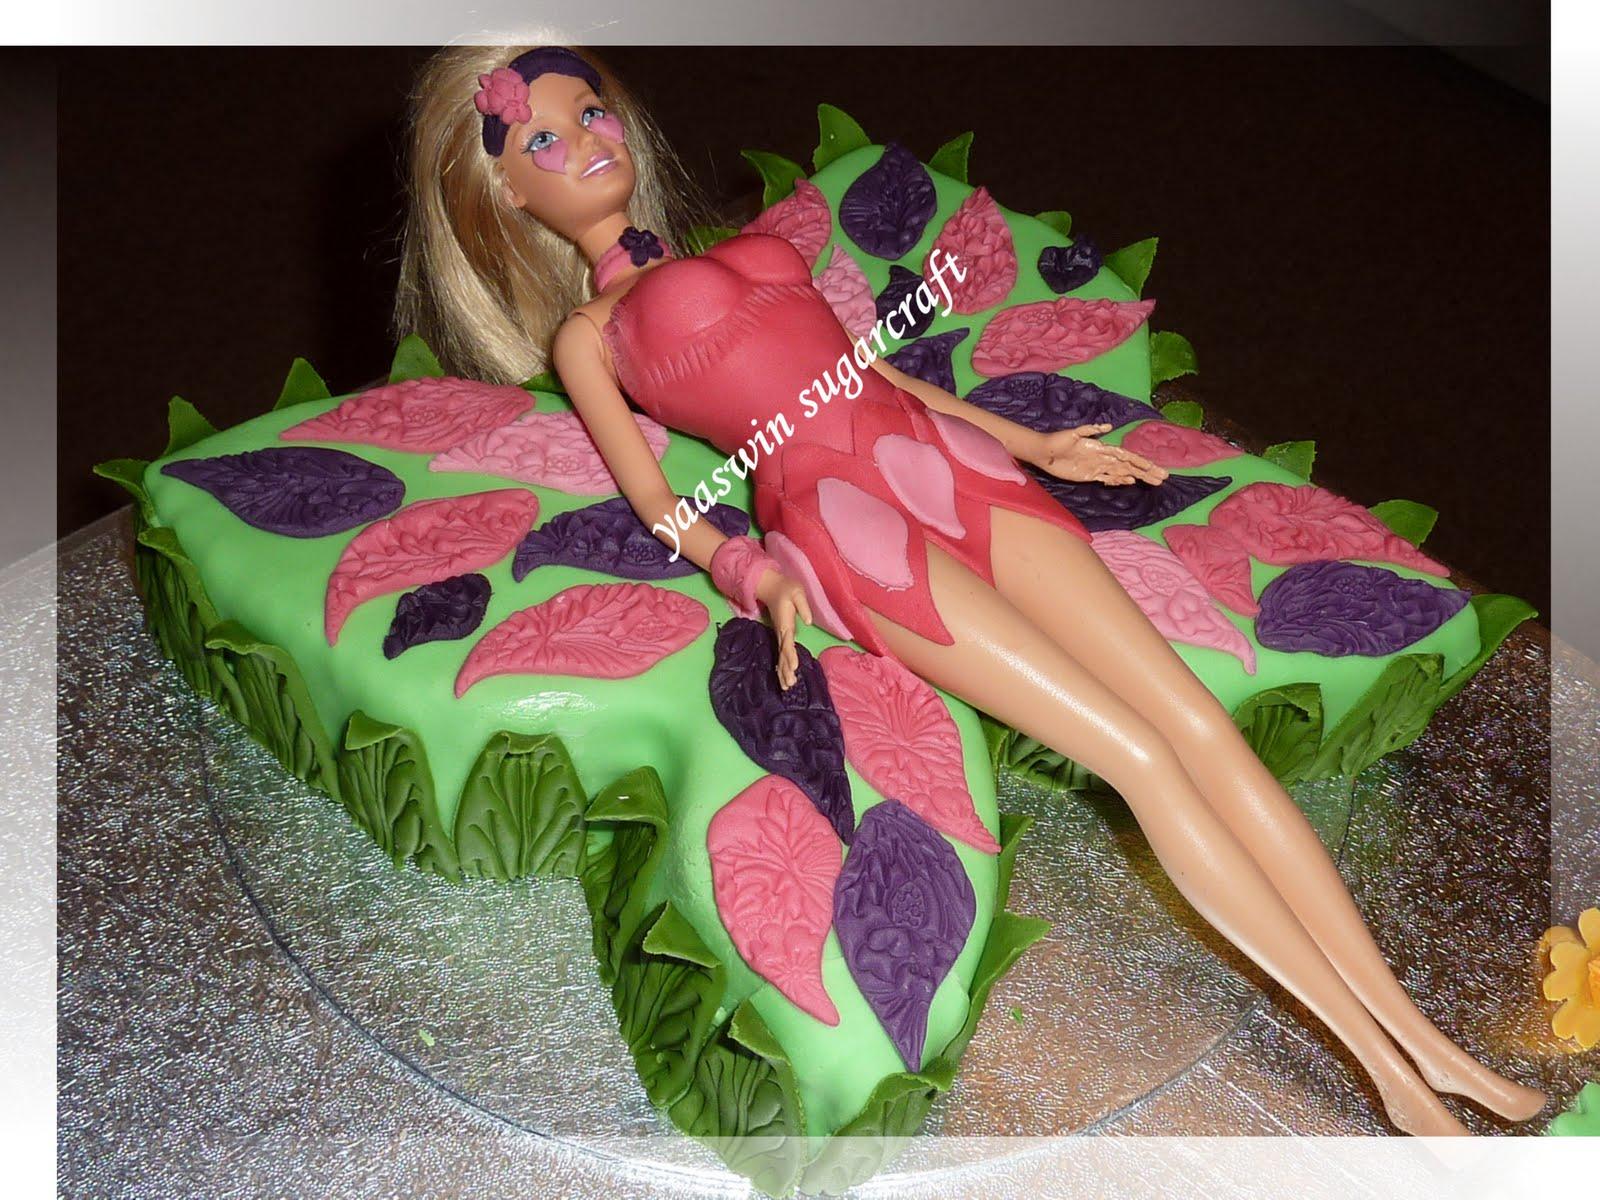 Barbie Chocolate Cake Images : Yaaswin Sugarcraft & Cakes: Barbie Mariposa Chocolate cake